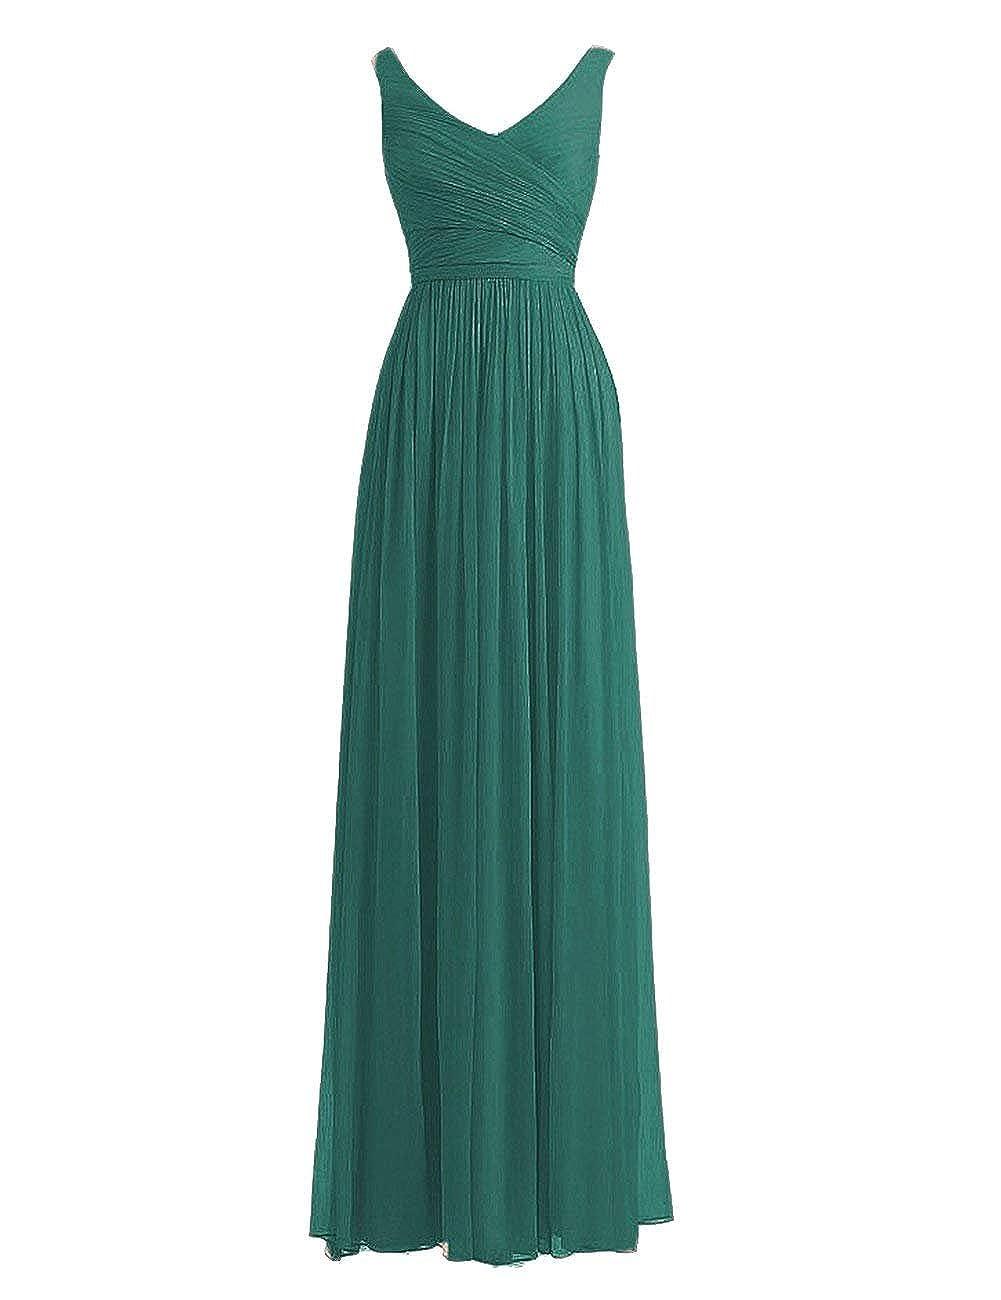 Dark Green Fanciest Women's Double V Neck Long Bridesmaid Dresses 2018 Wedding Party Dress